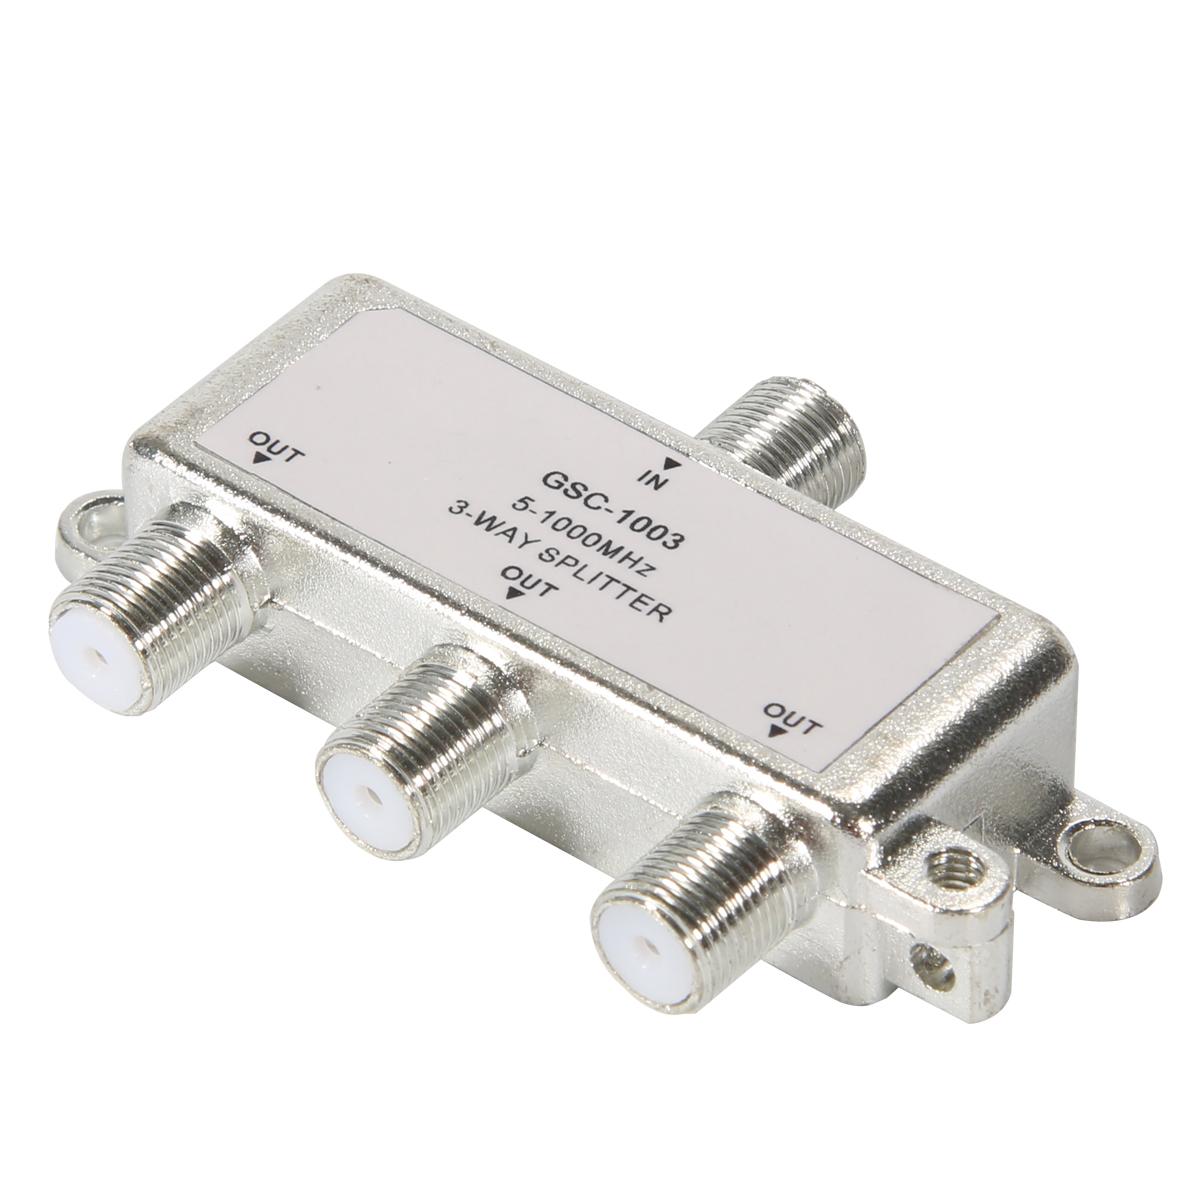 3 Way HDTV TV Aerial Splitter Antenna Cable 5-1000 MHz F Type Splitter BI127(China (Mainland))